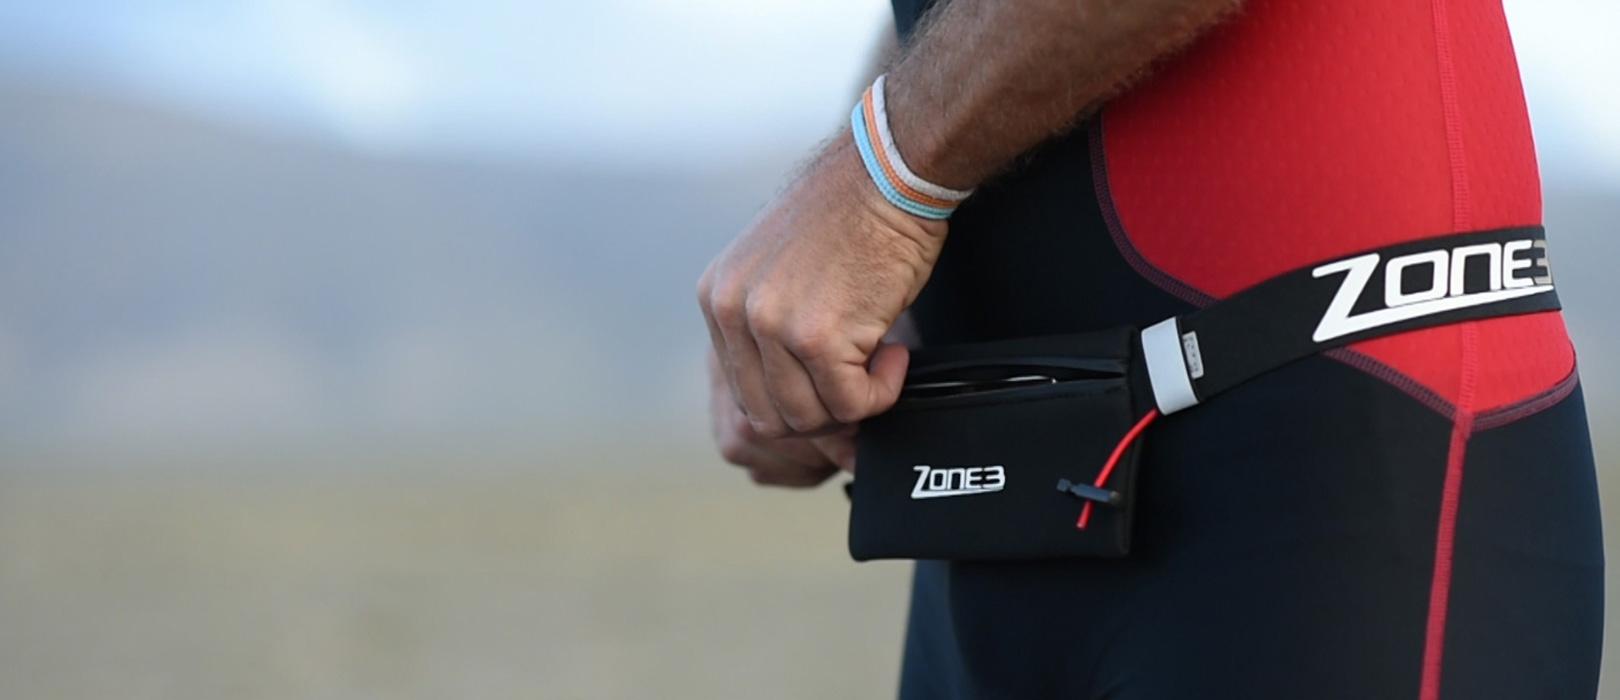 Neoprene-Pouch-Belt---Lifestyle-(3)